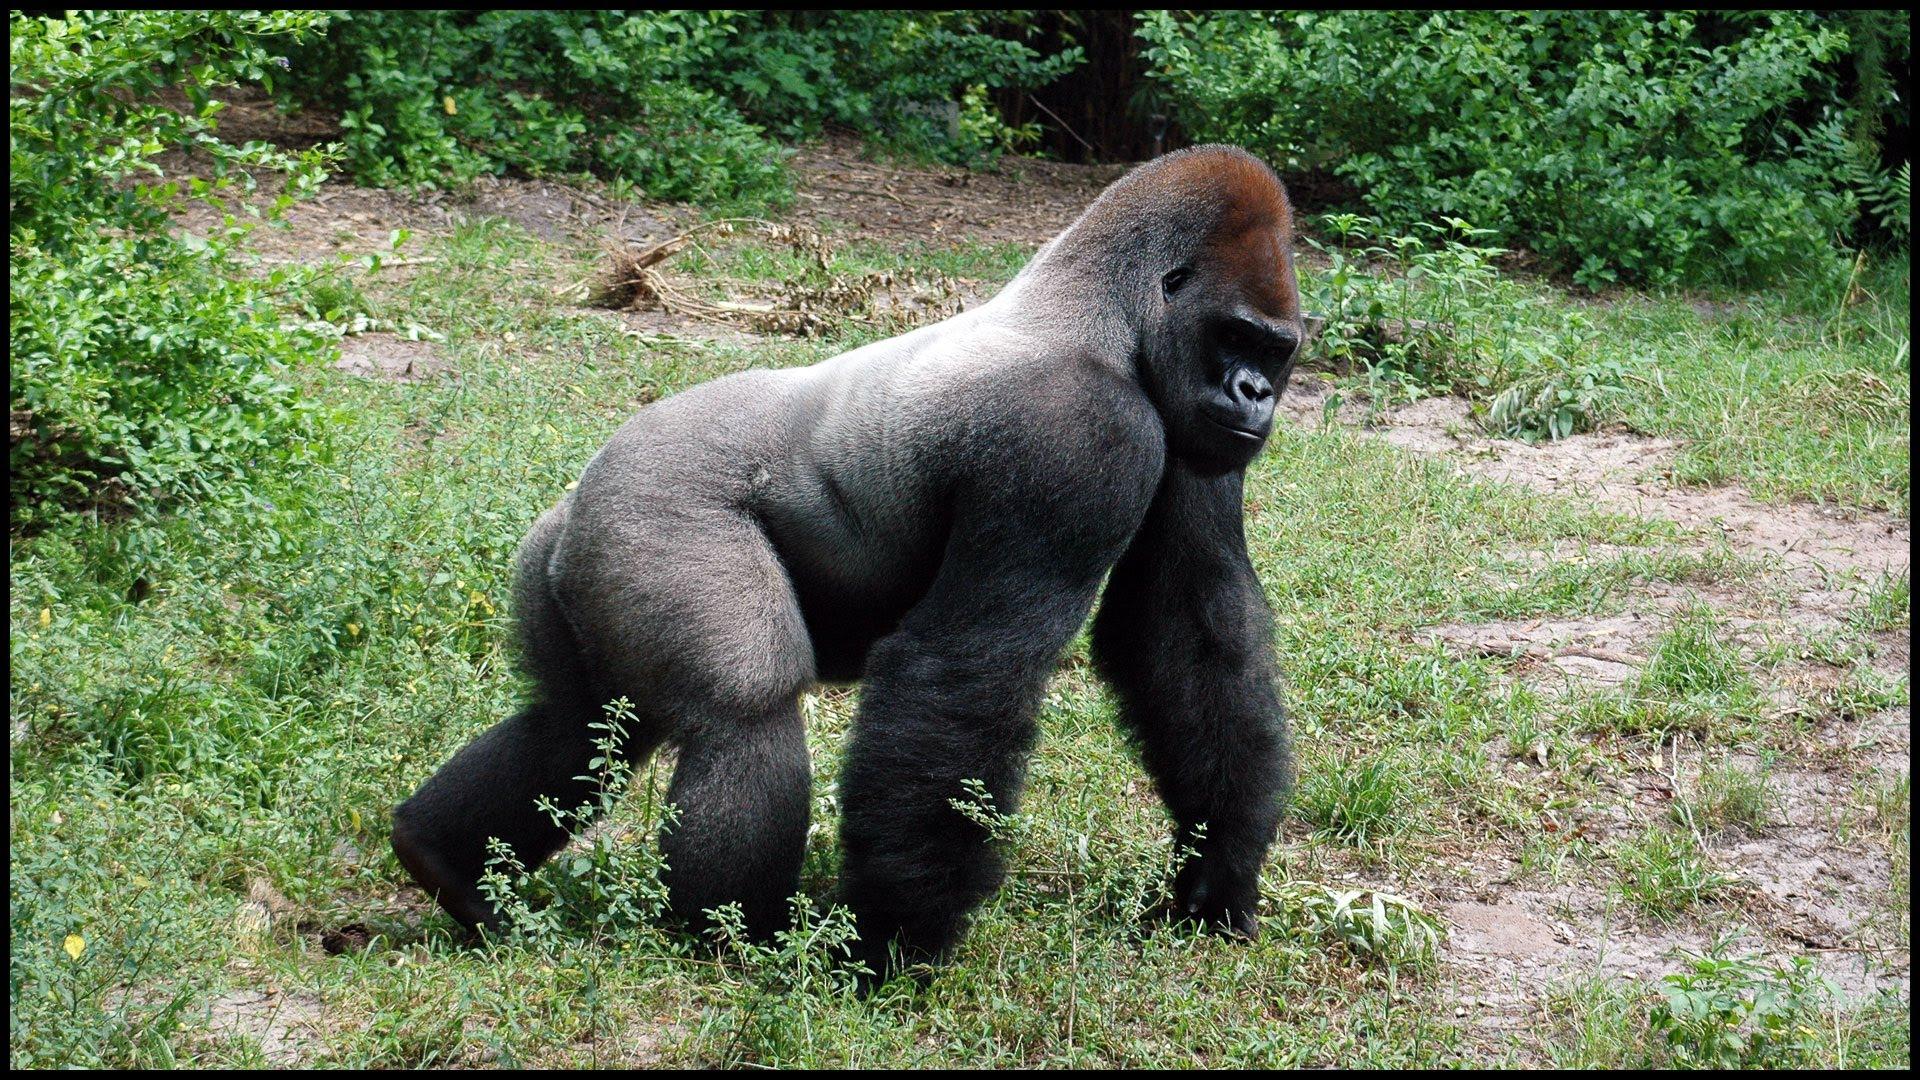 Silverback Gorillas (Gorilla gorilla) - YouTube